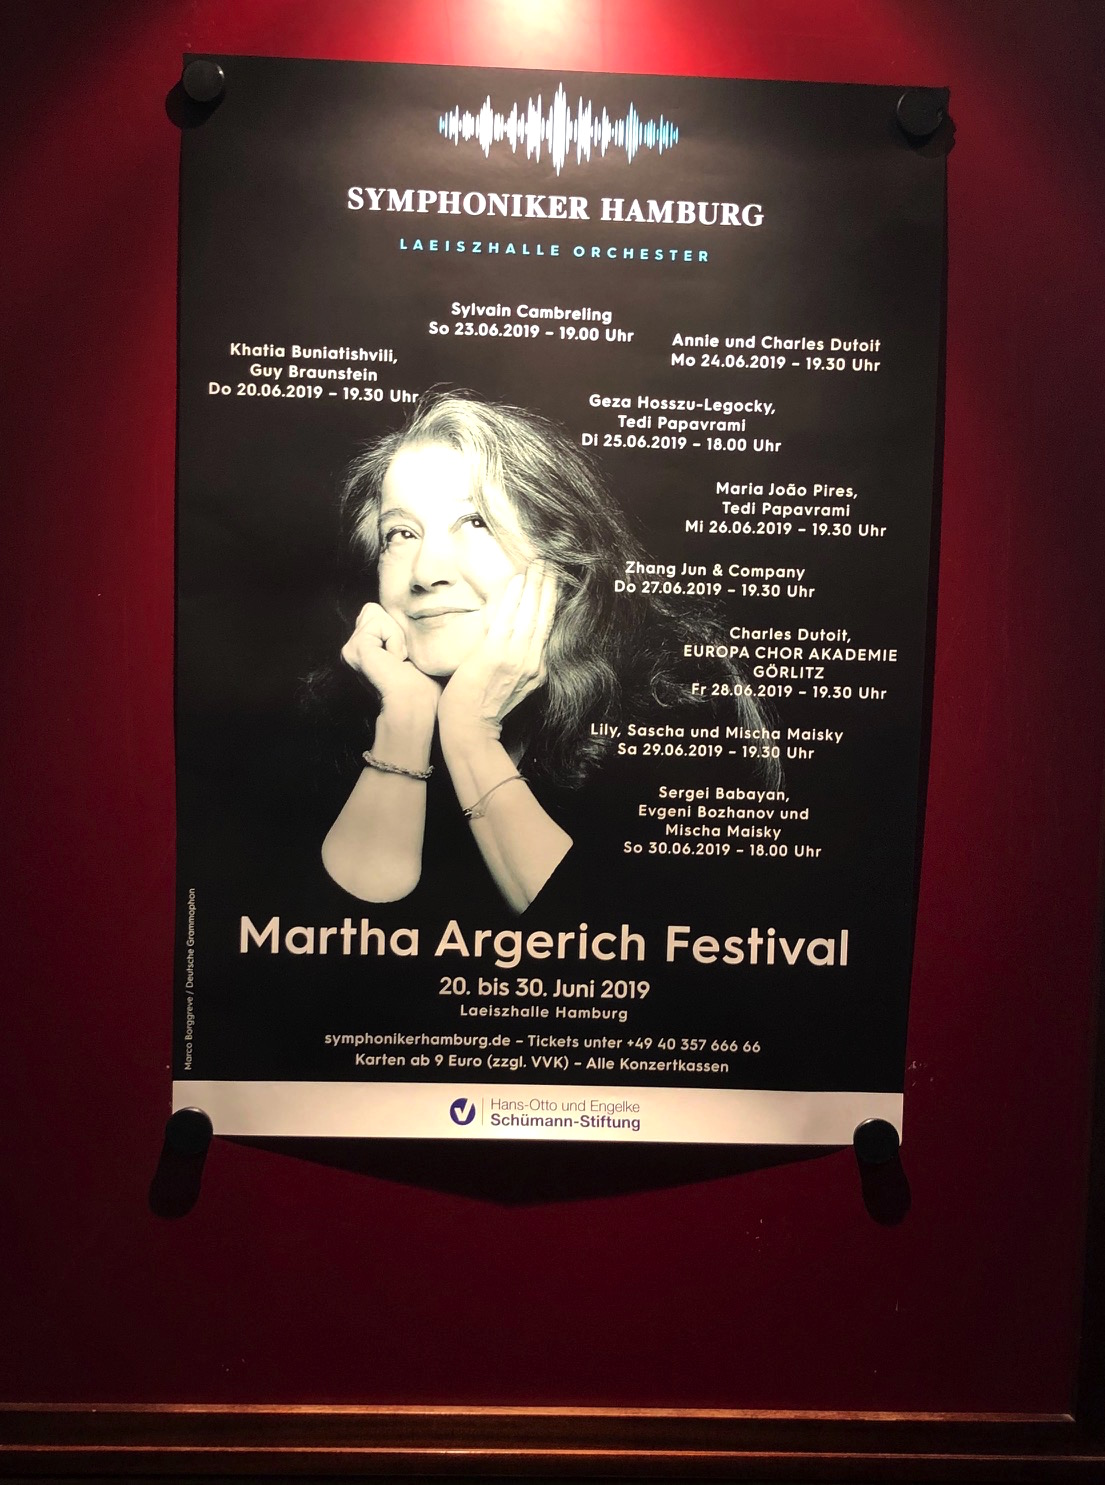 Martha Argerich Festival